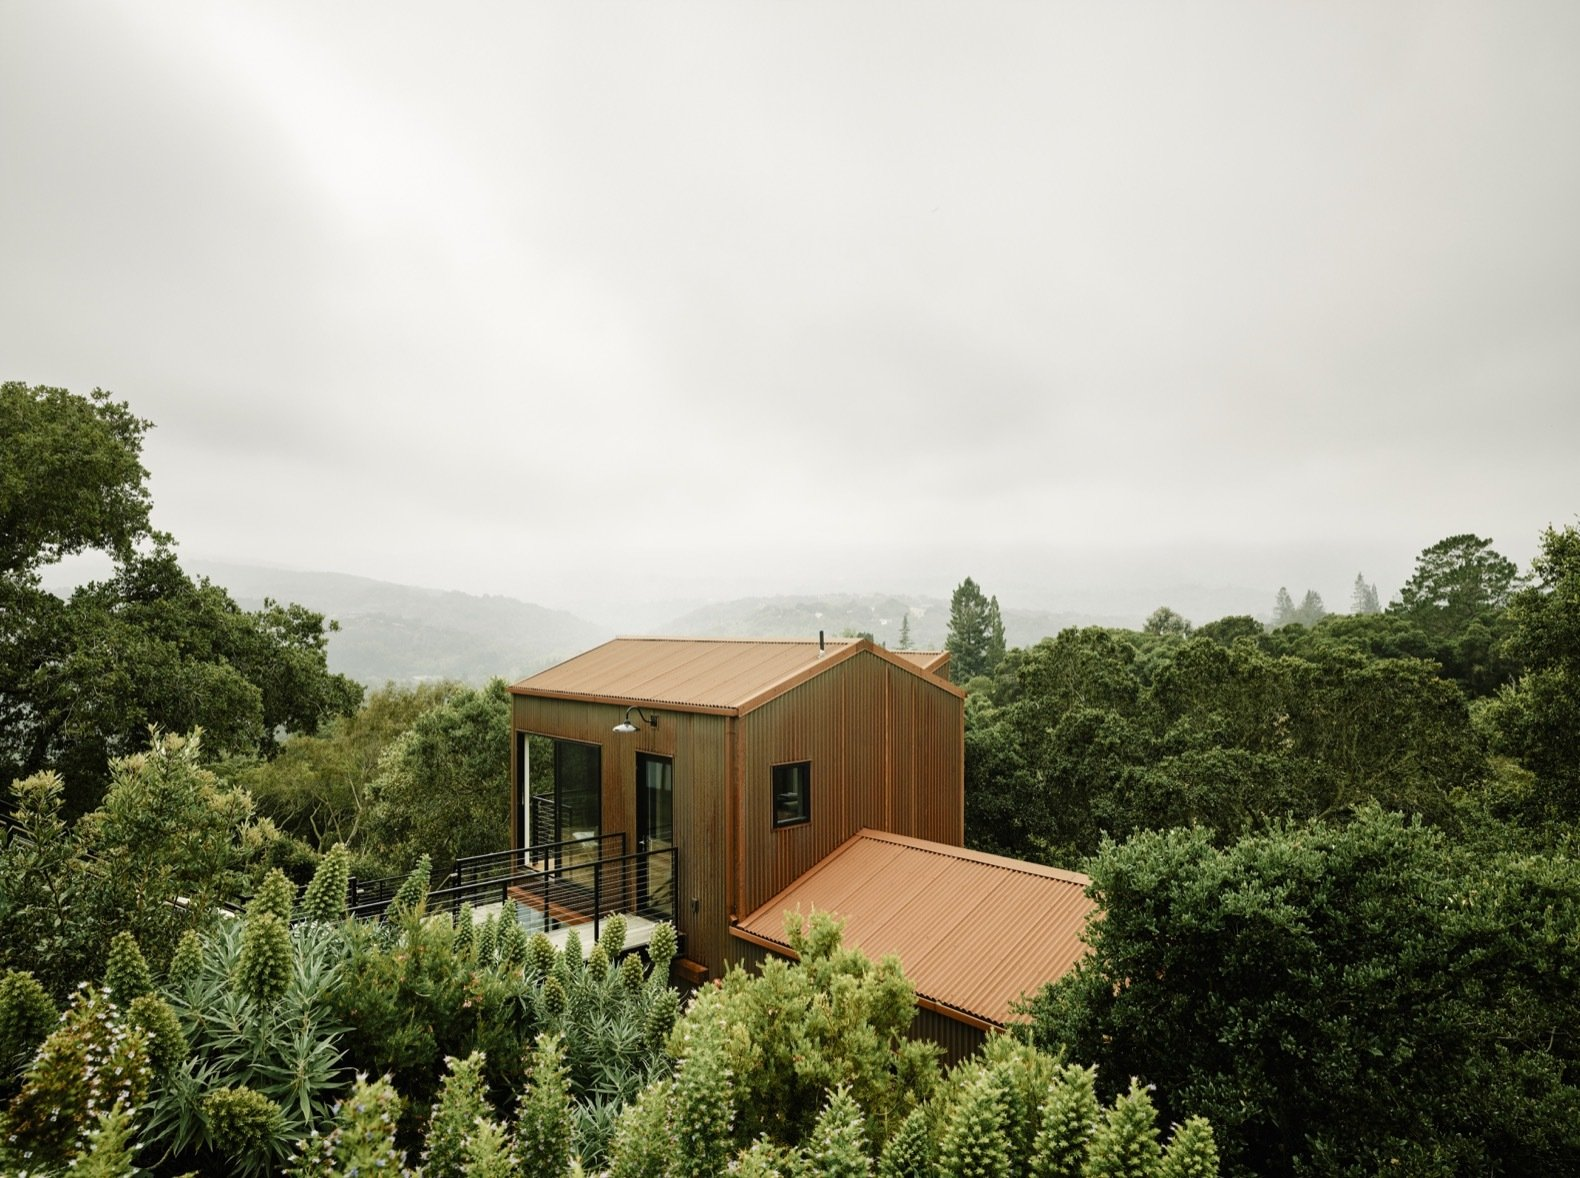 Portola Valley House exterior